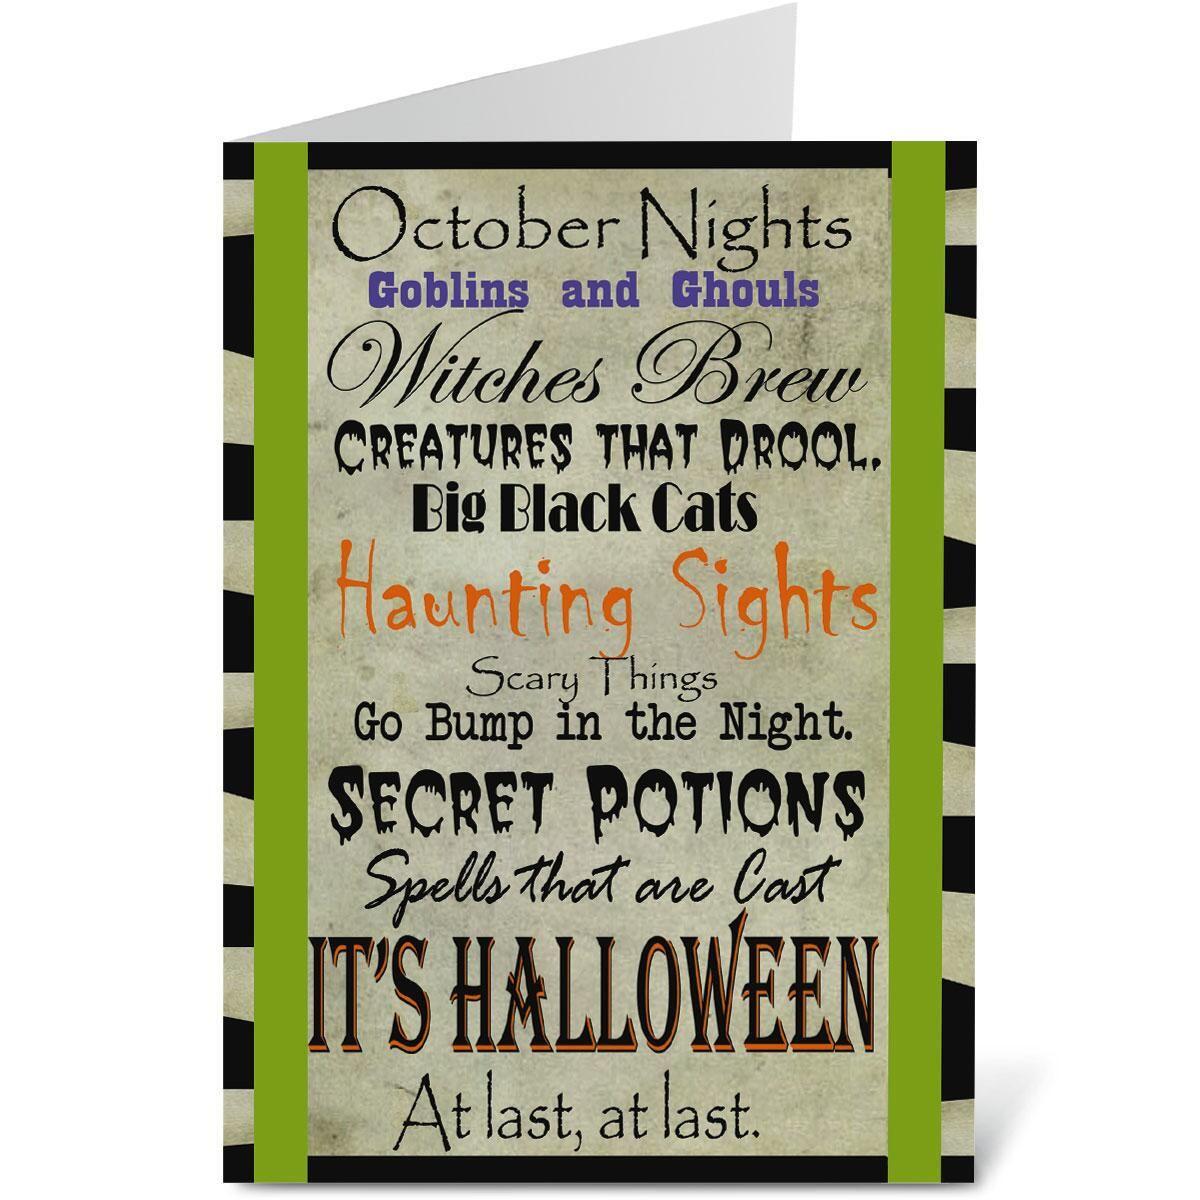 It's Halloween Cards